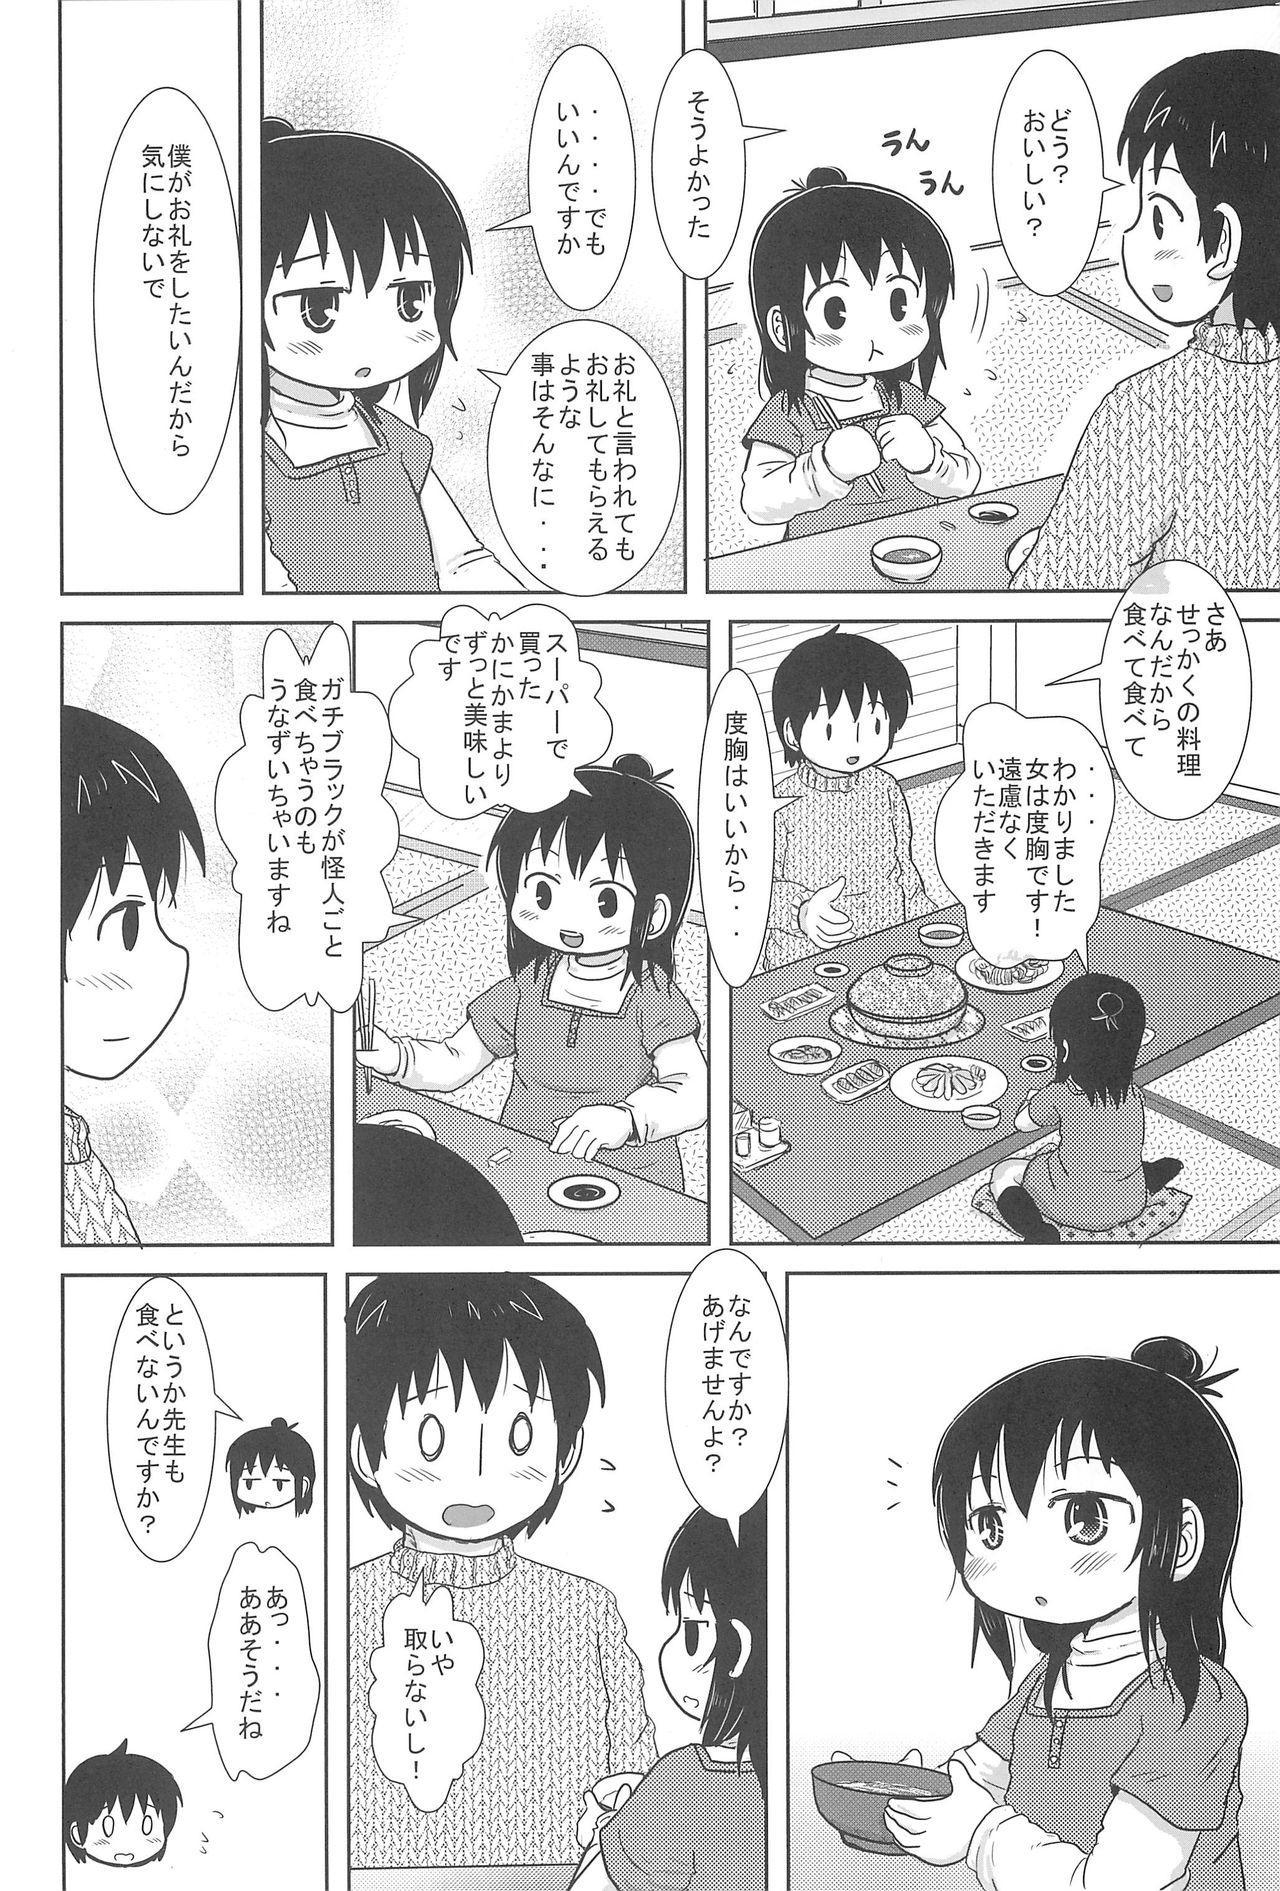 Futari de Oishiku 5